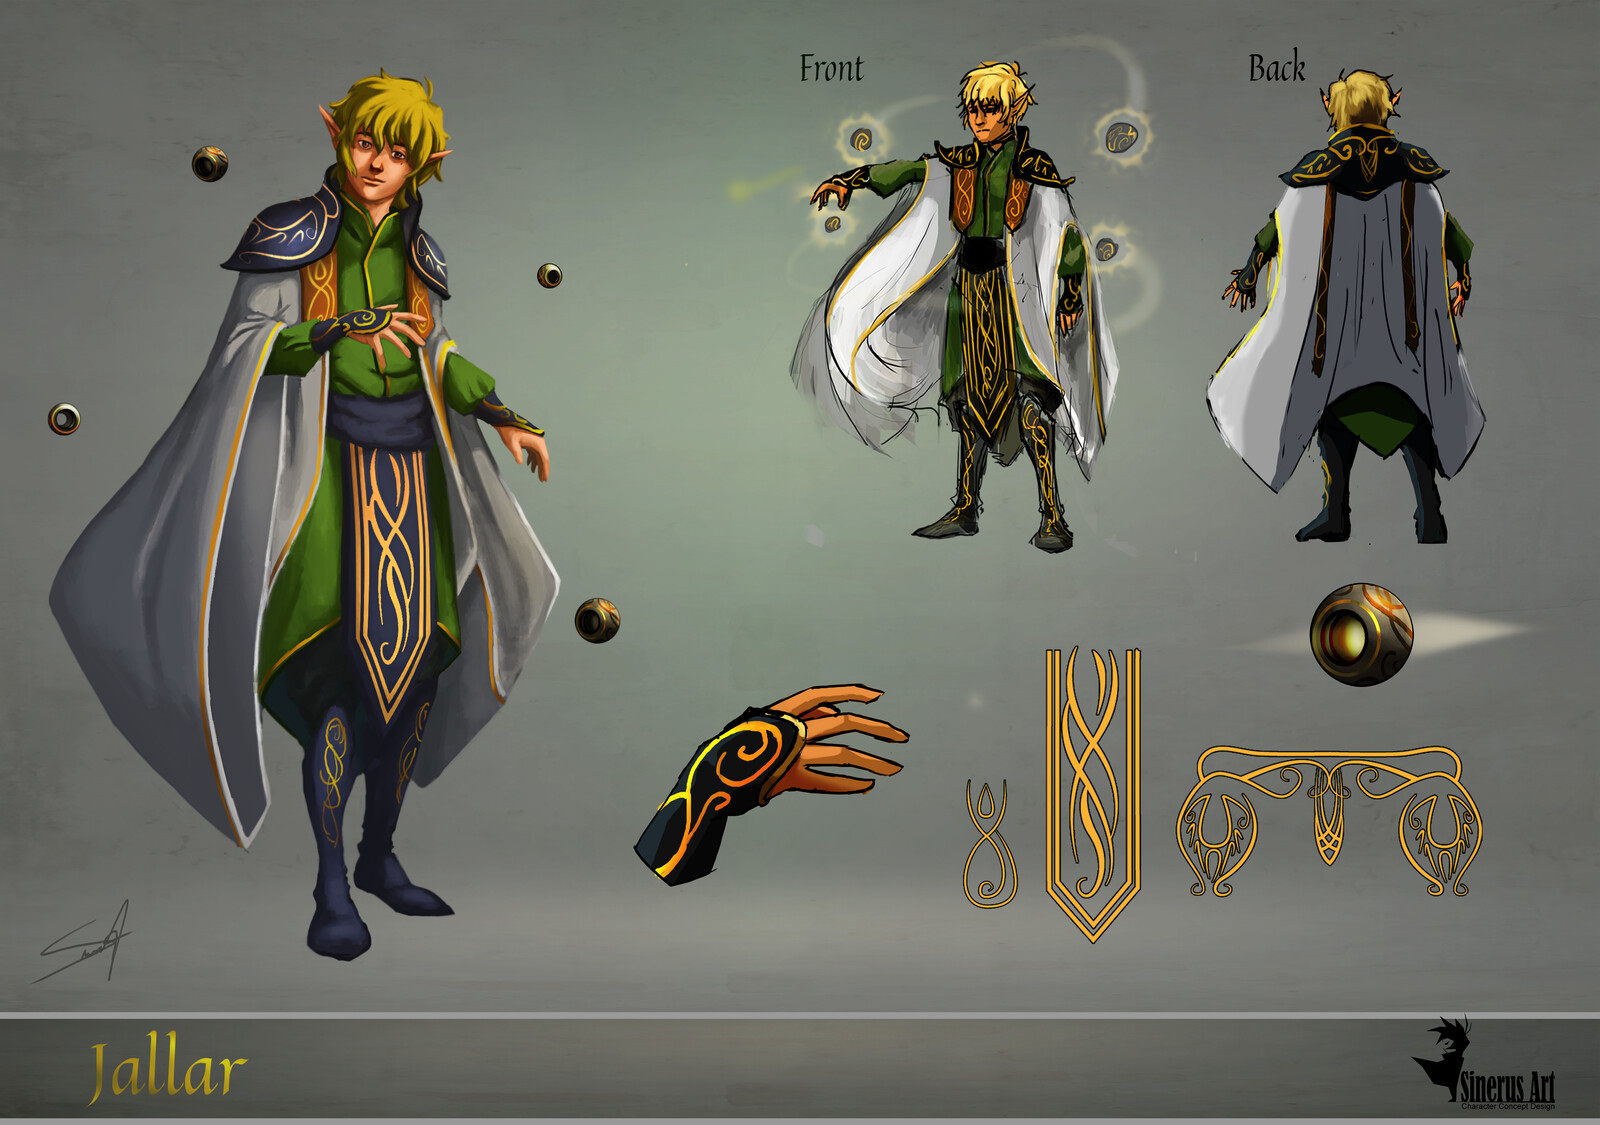 Jallar Character Design